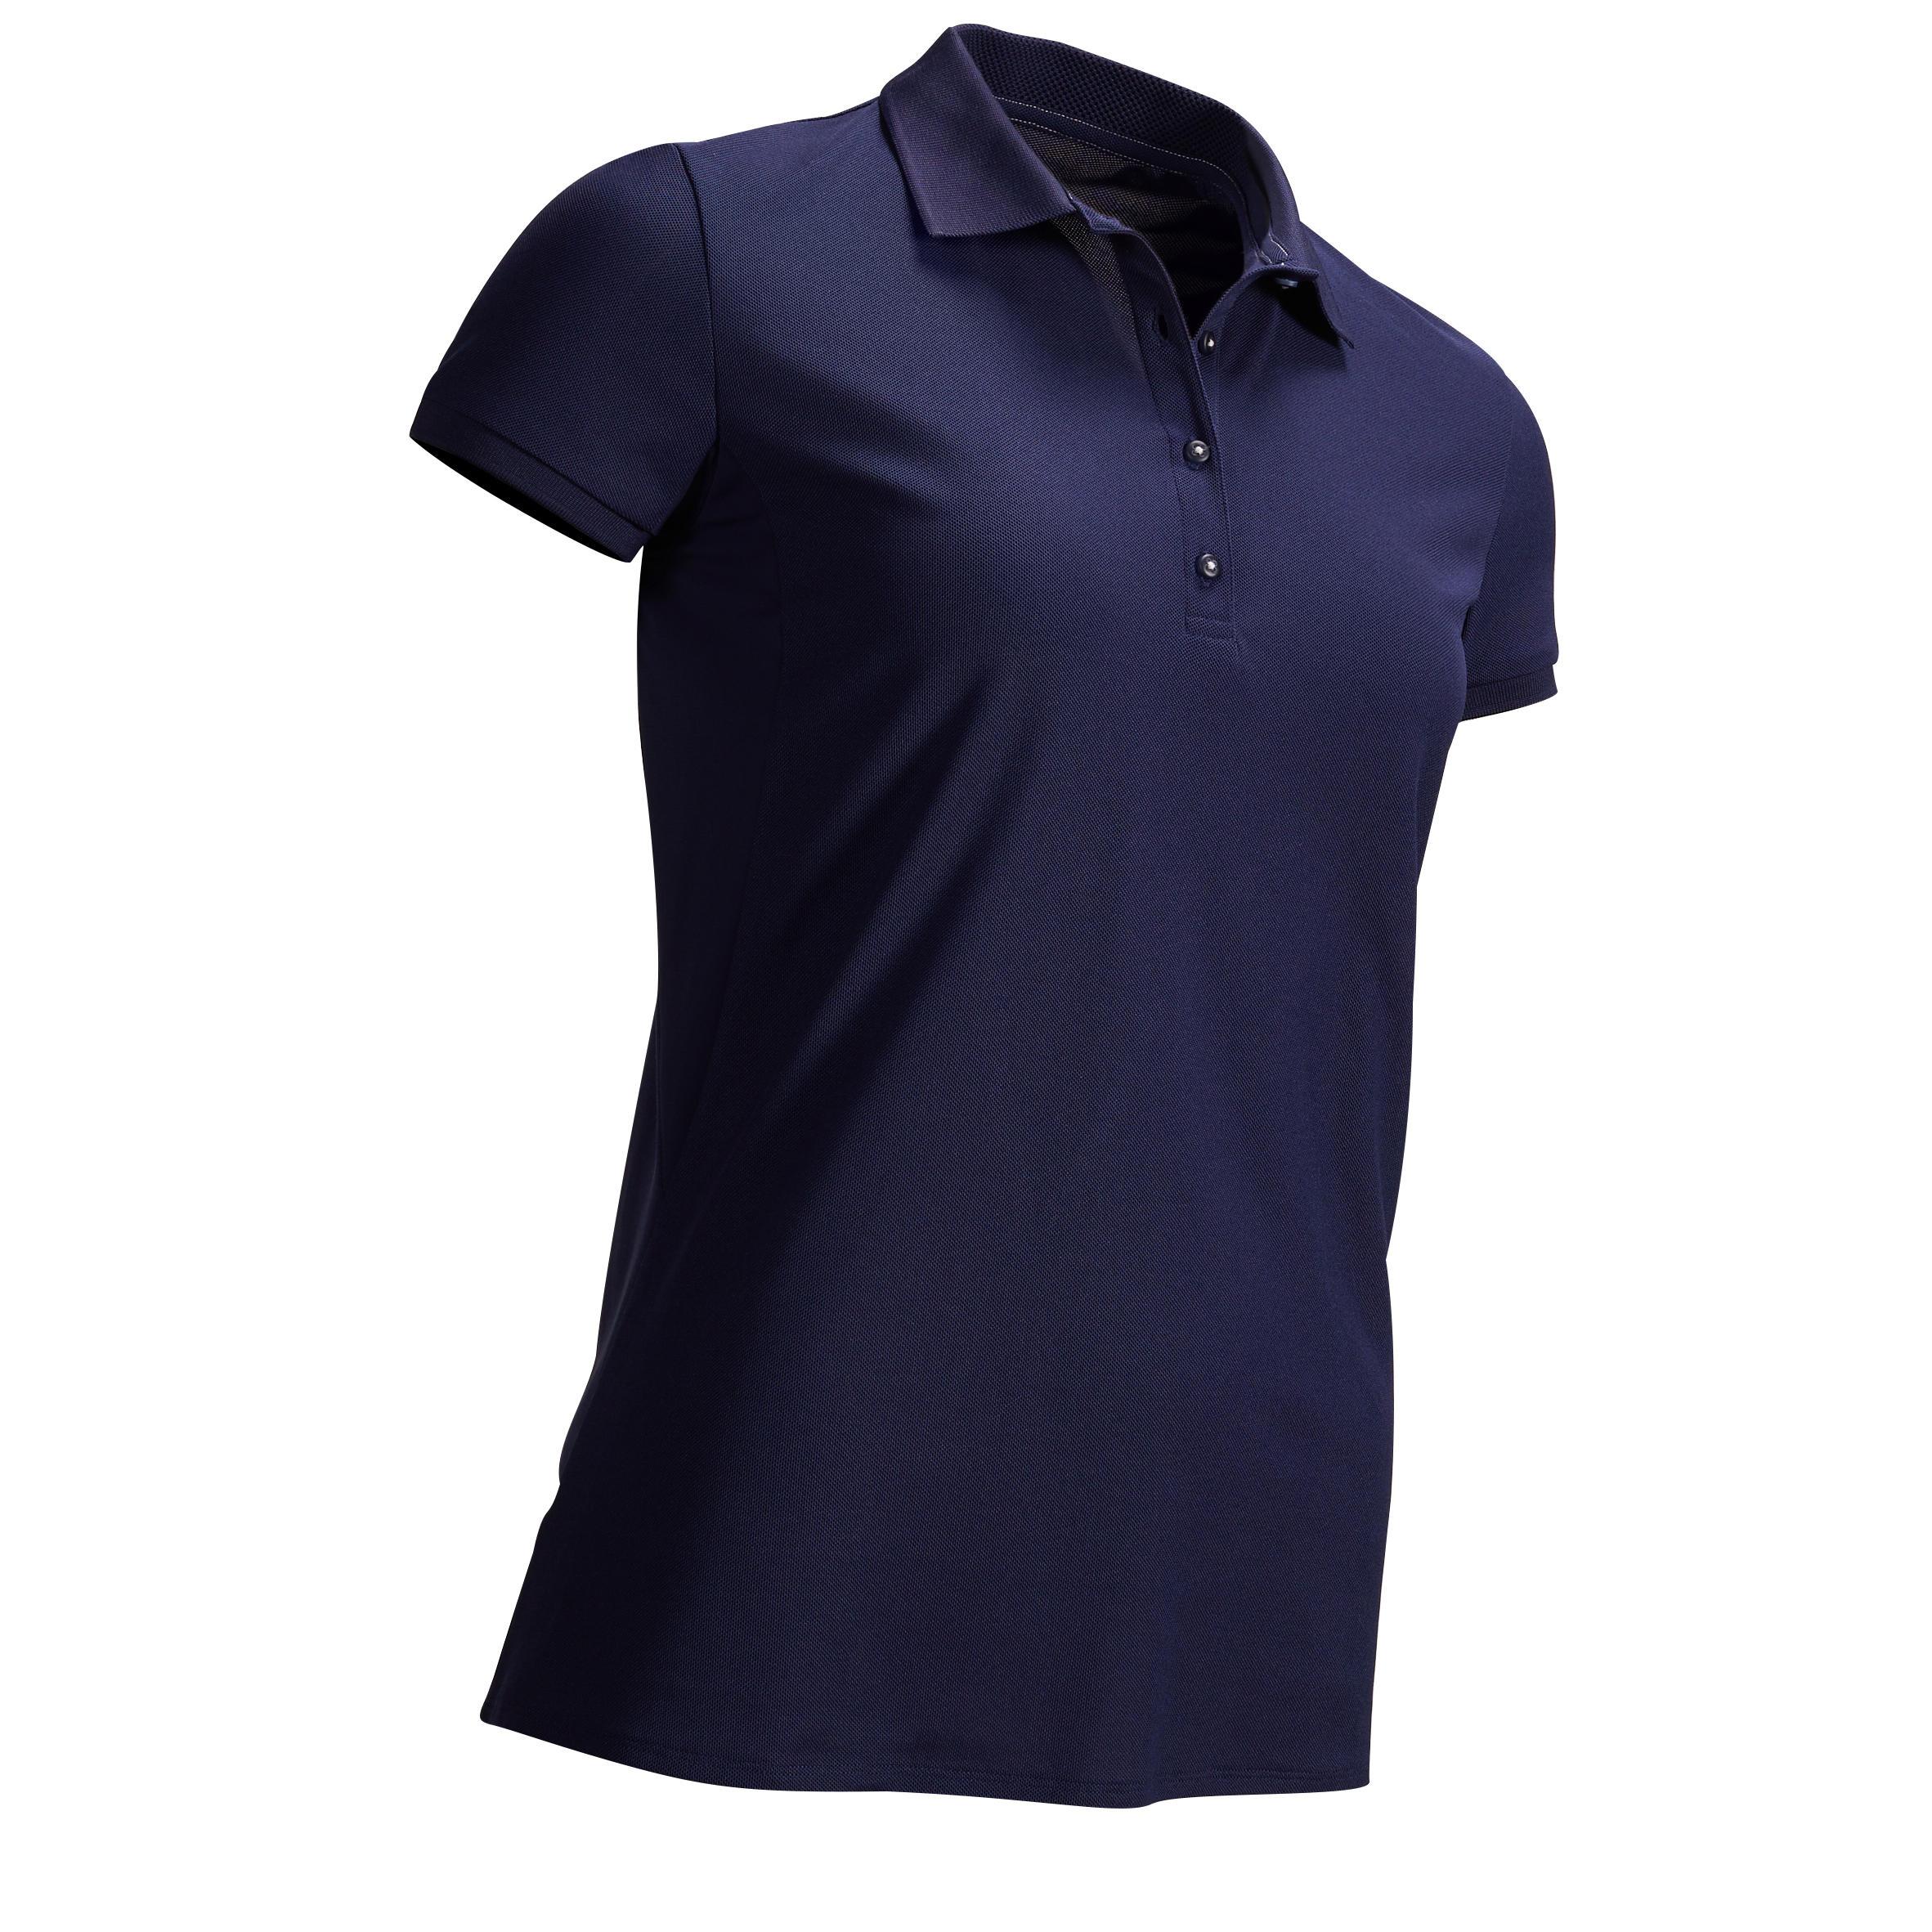 Golf Poloshirt Damen atmungsaktiv | Bekleidung > Shirts > Poloshirts | Inesis